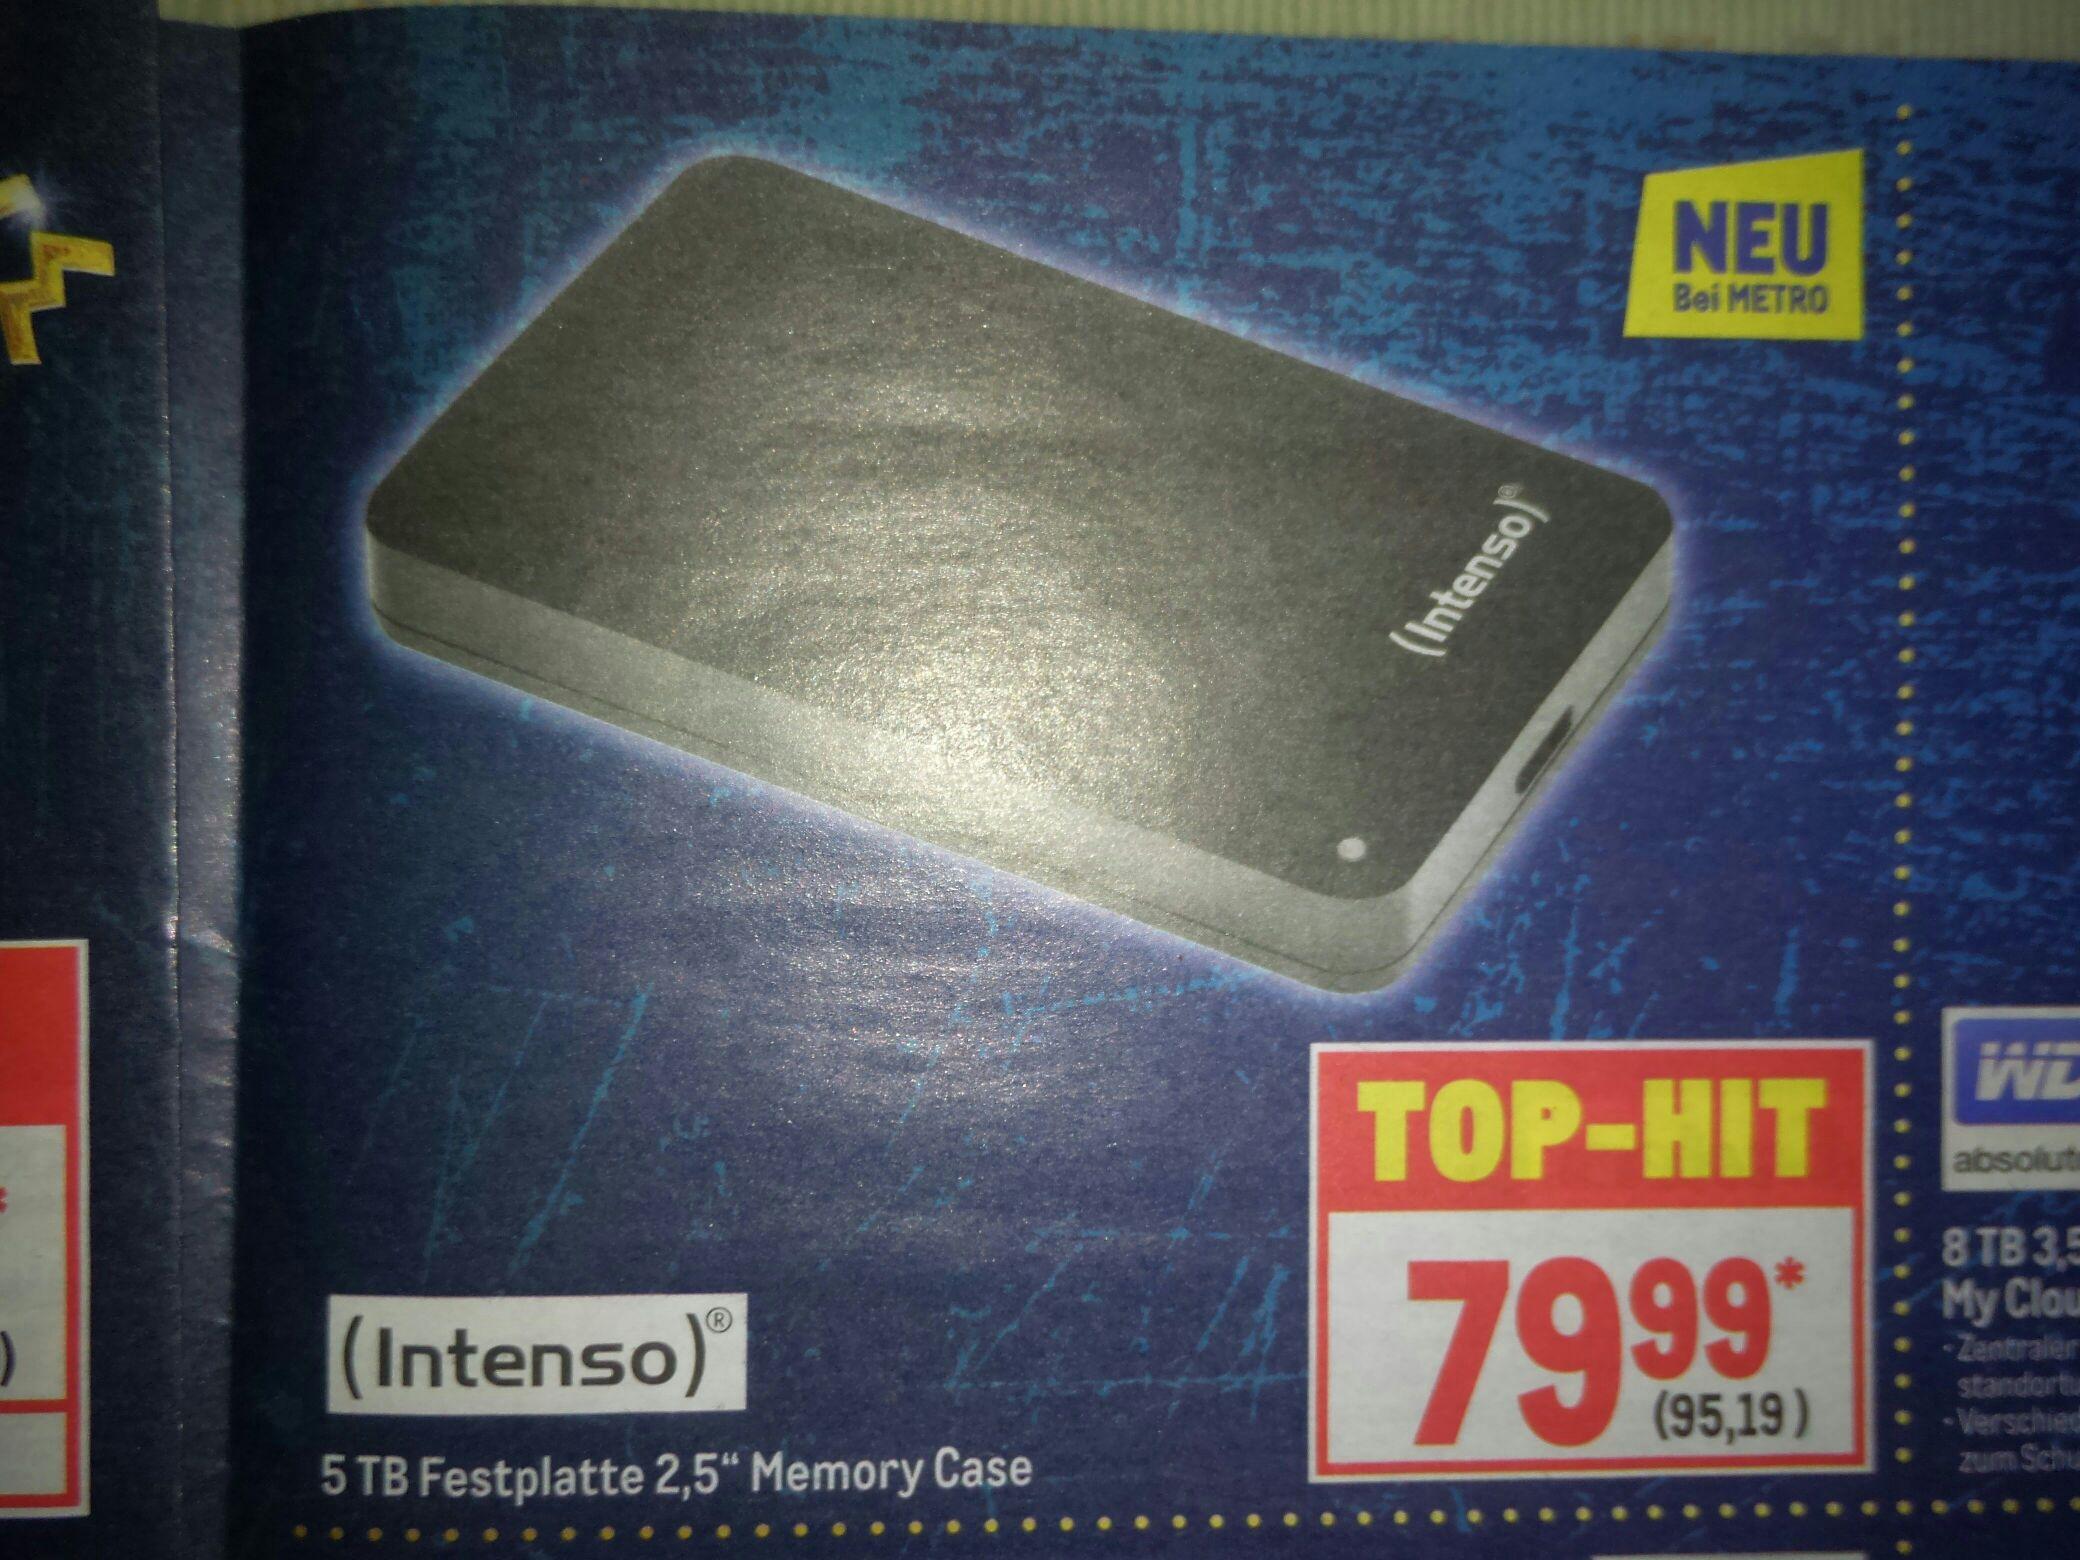 "METRO: 5TB Intenso USB Festplatte 2,5"""